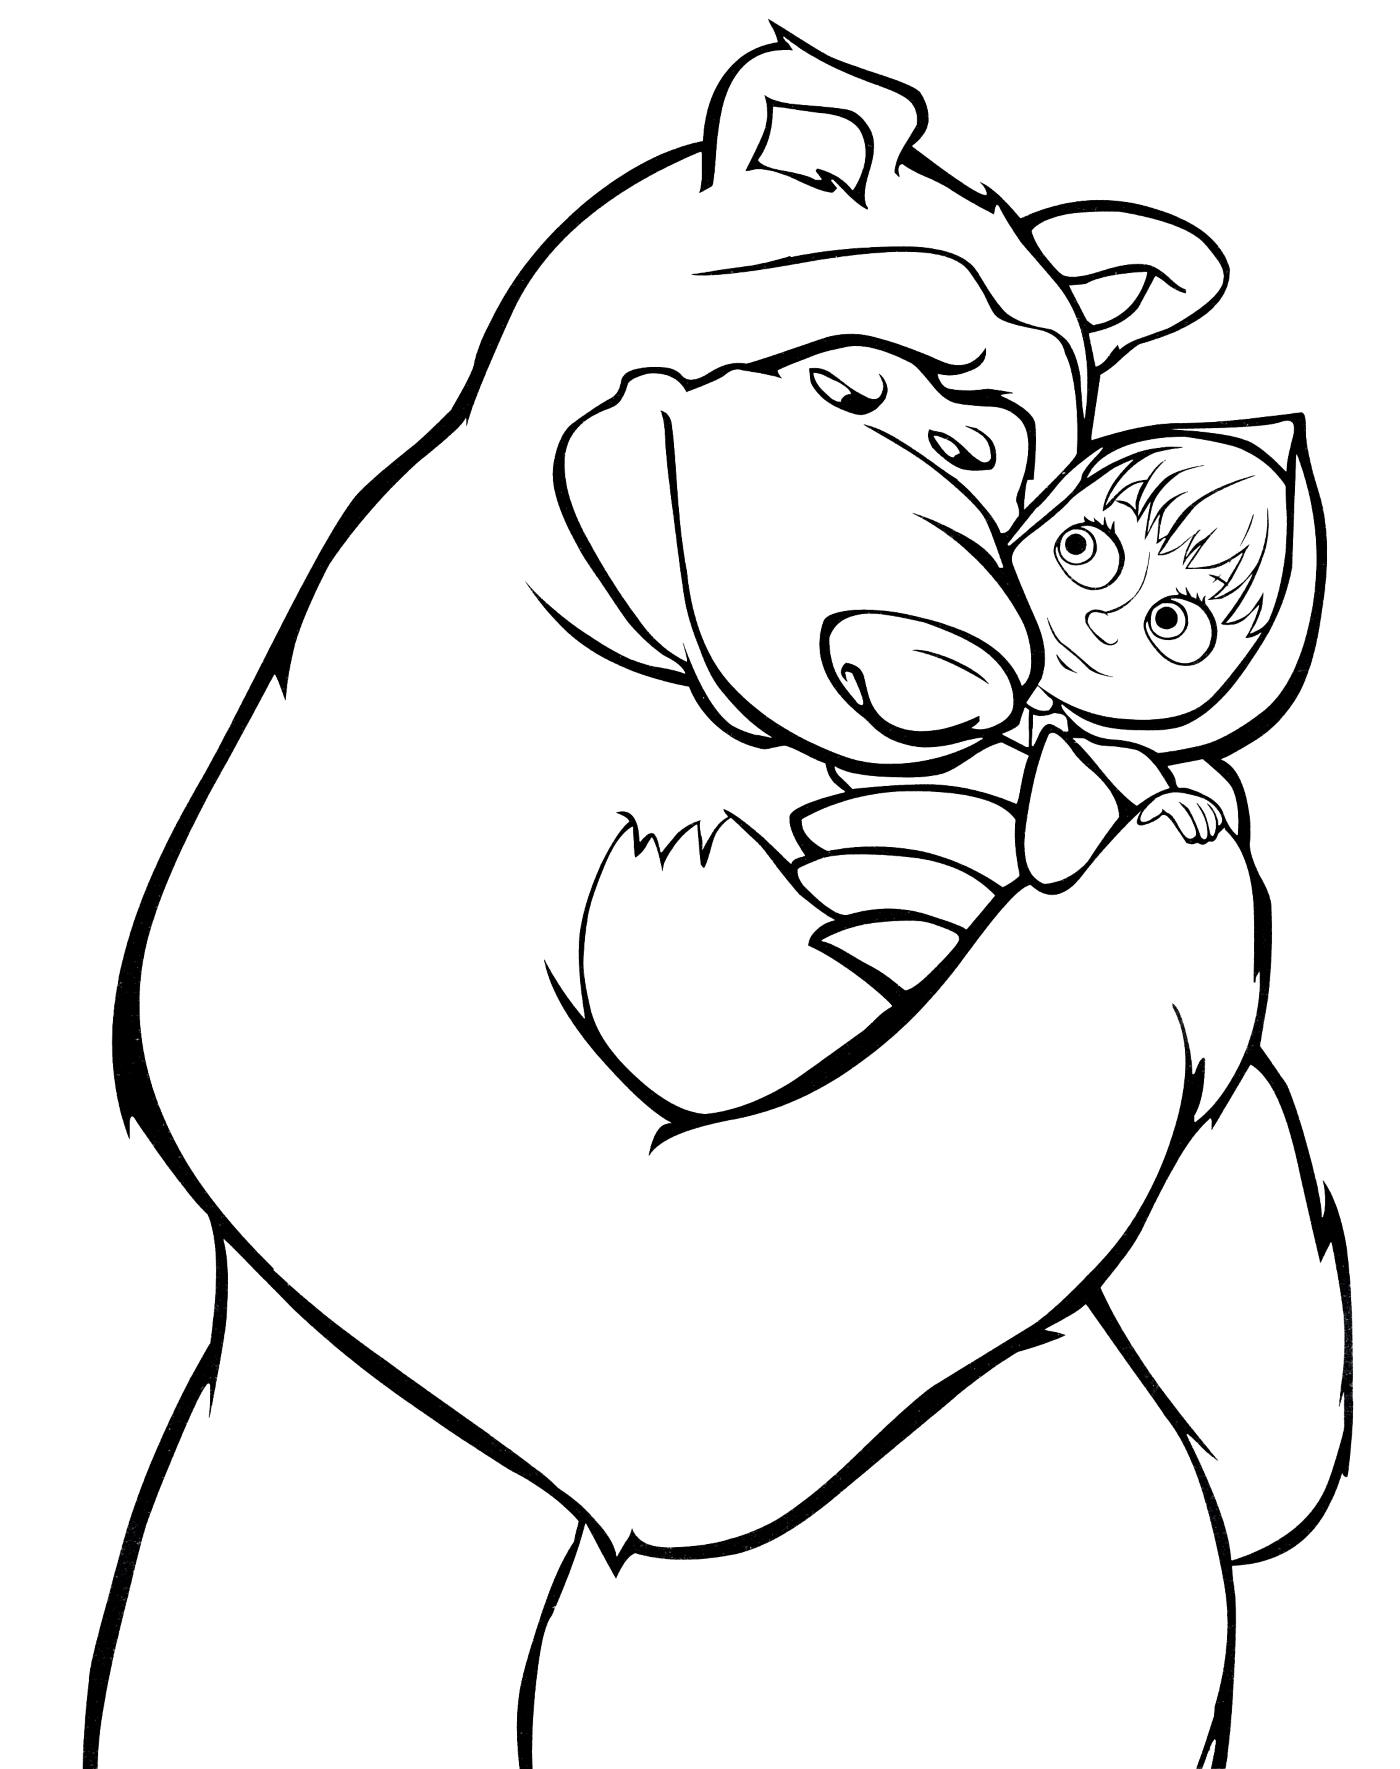 Маша и Медведь - раскраска №419 | Printonic.ru